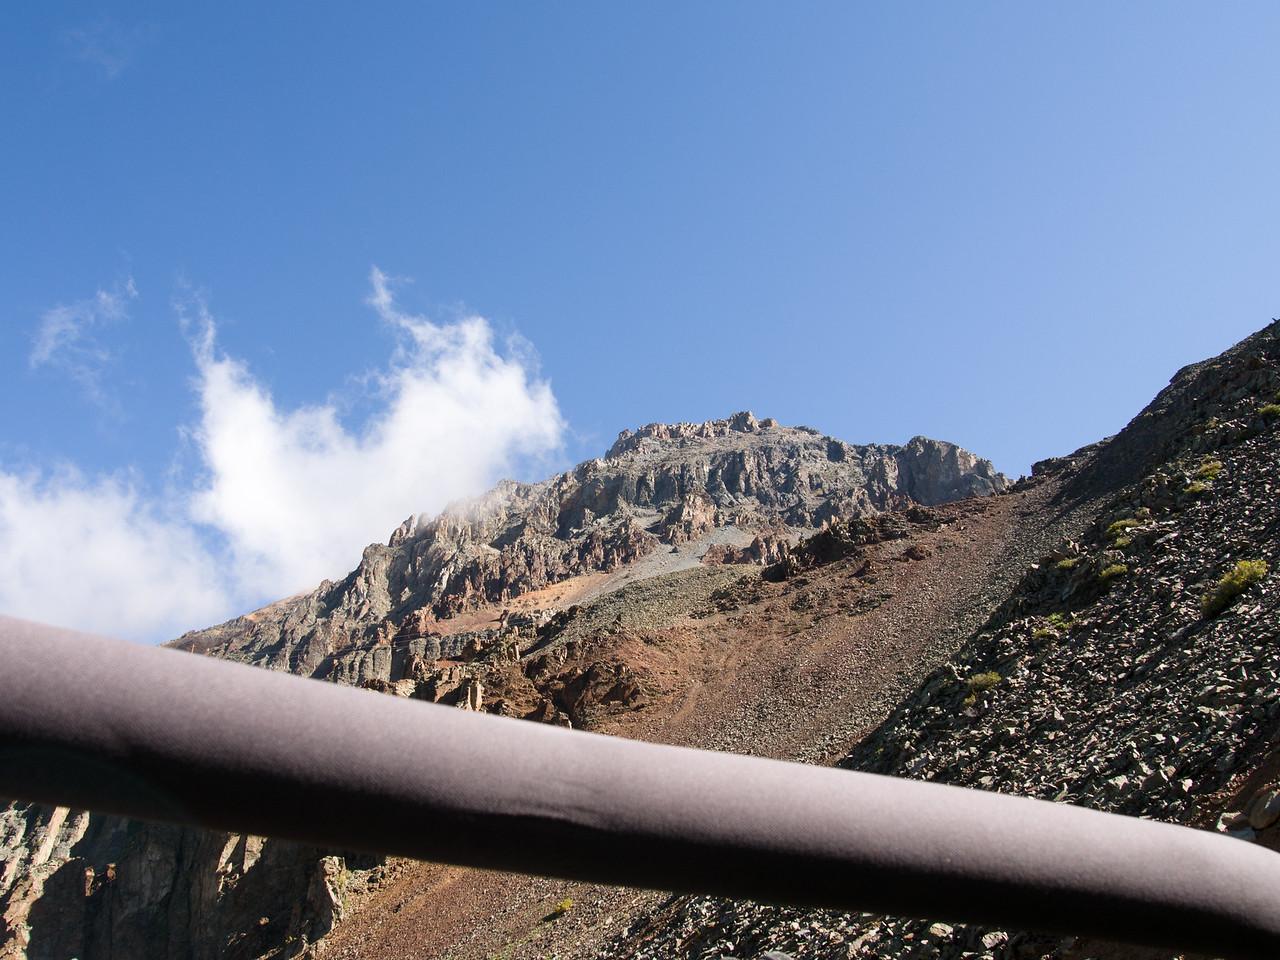 Craggy Ridges